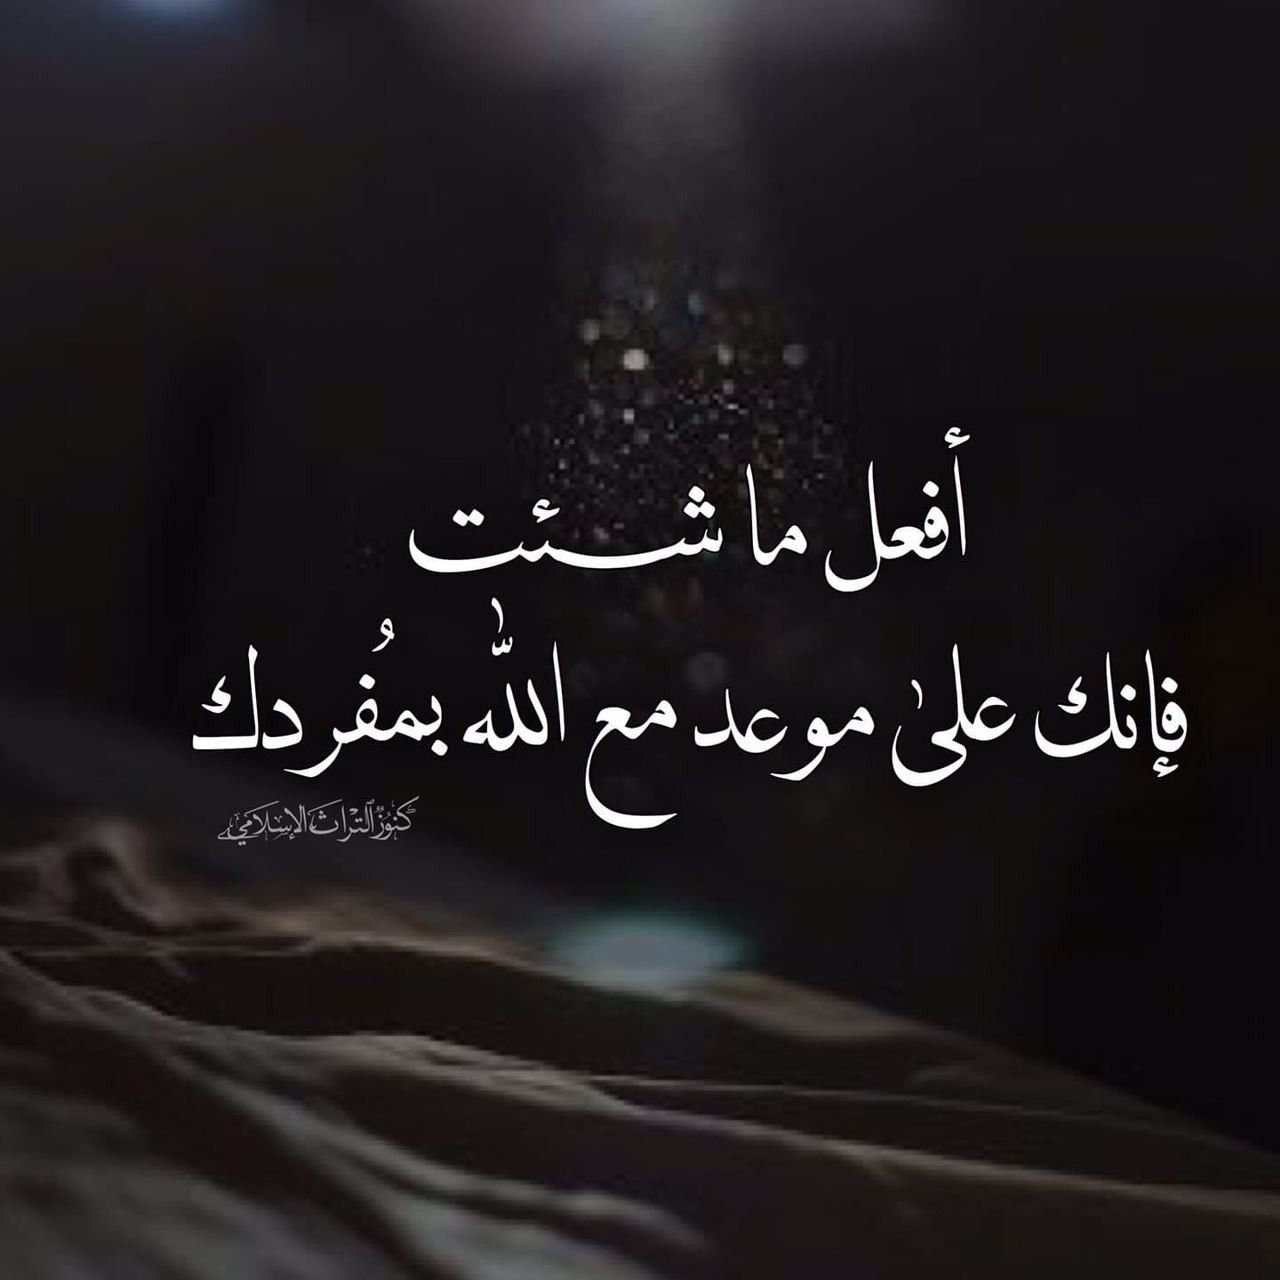 بم فردك Calligraphy Arabic Calligraphy Quotes